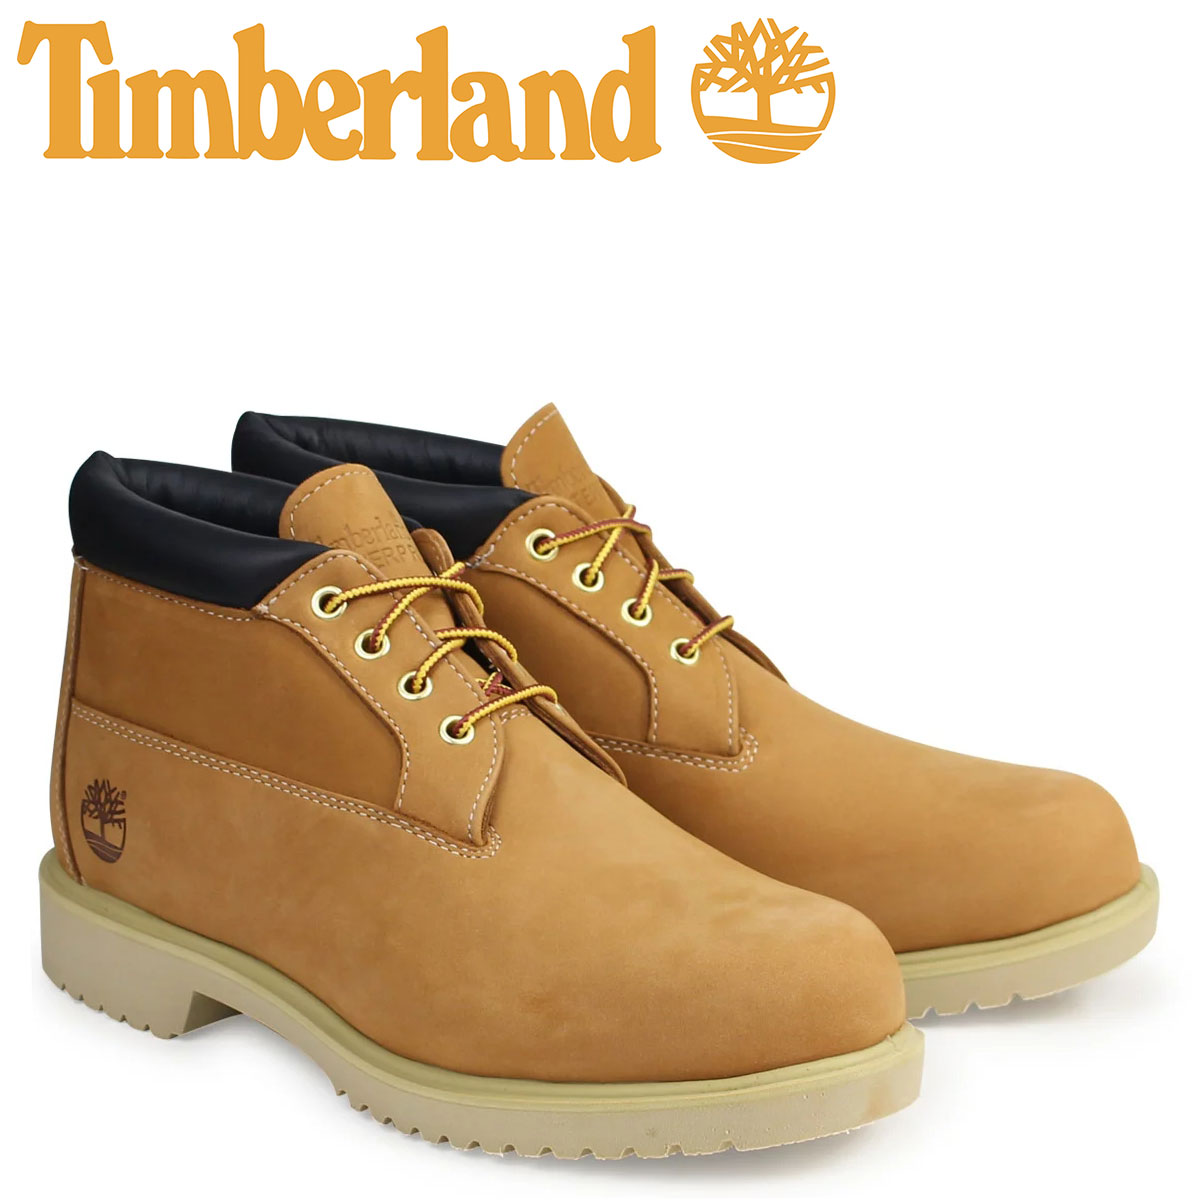 ff9ae442ca5c19 Timberland Timberland waterproof chukka boot Waterproof Chukka Boot 50061  wheat men's ...